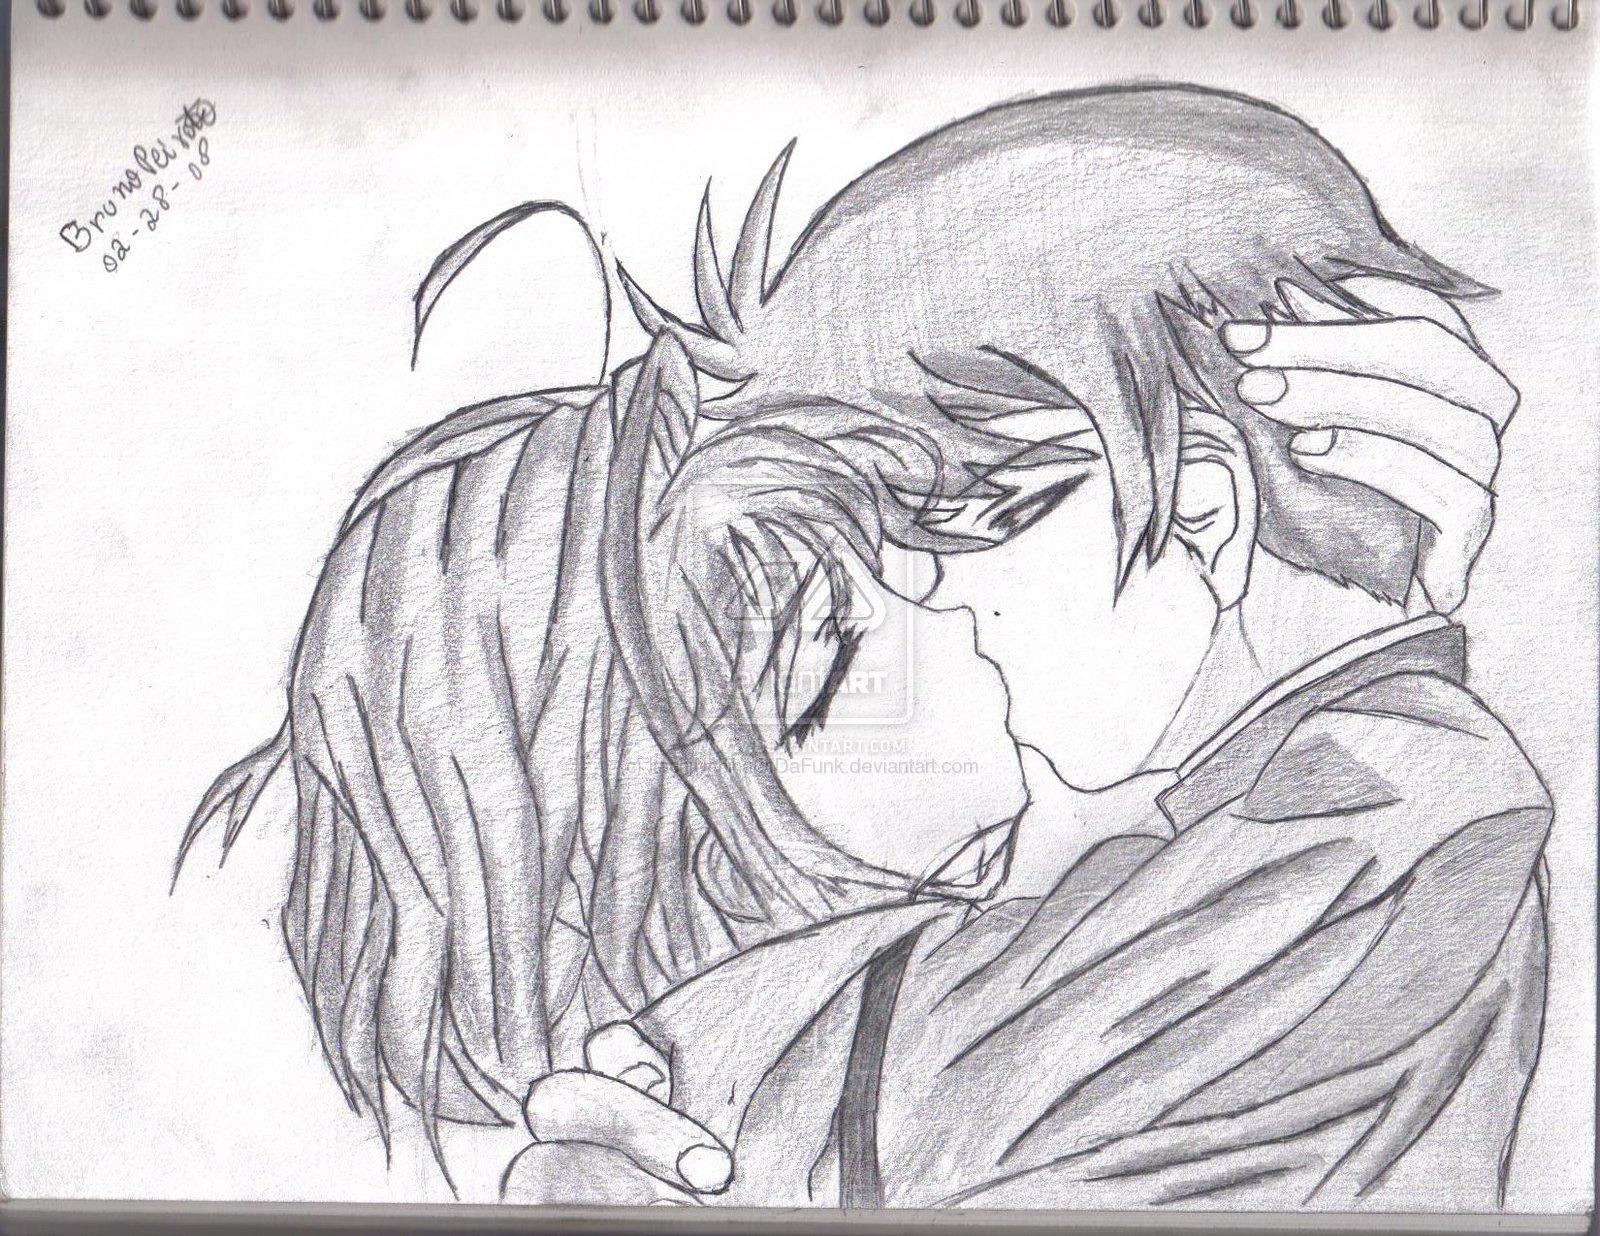 Drawn kisses cute couple Com & Pictures Moyuk bet365